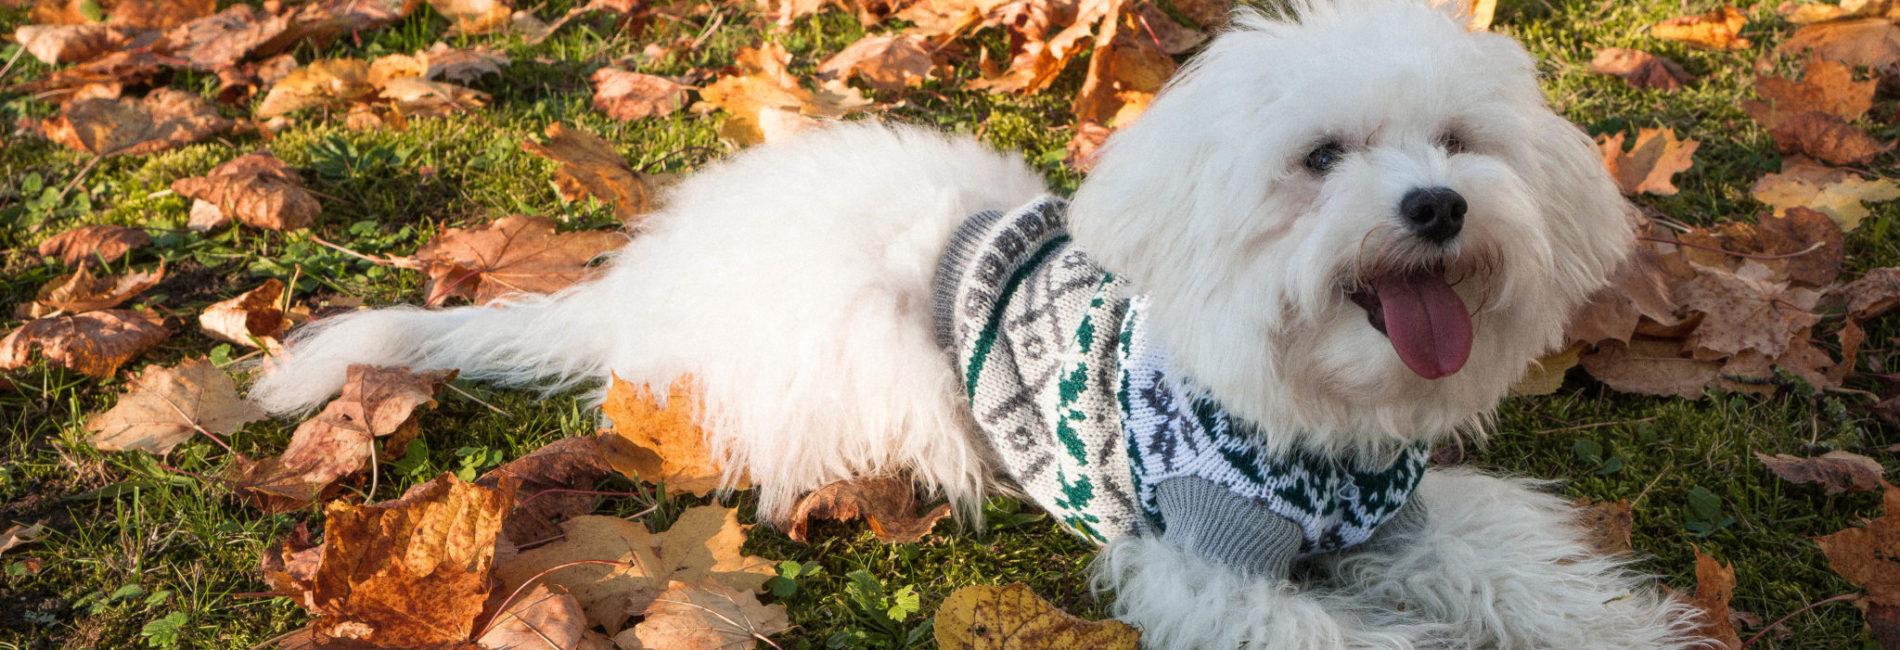 Arthemisclothing – Auch Hunde tragen gerne Wolle